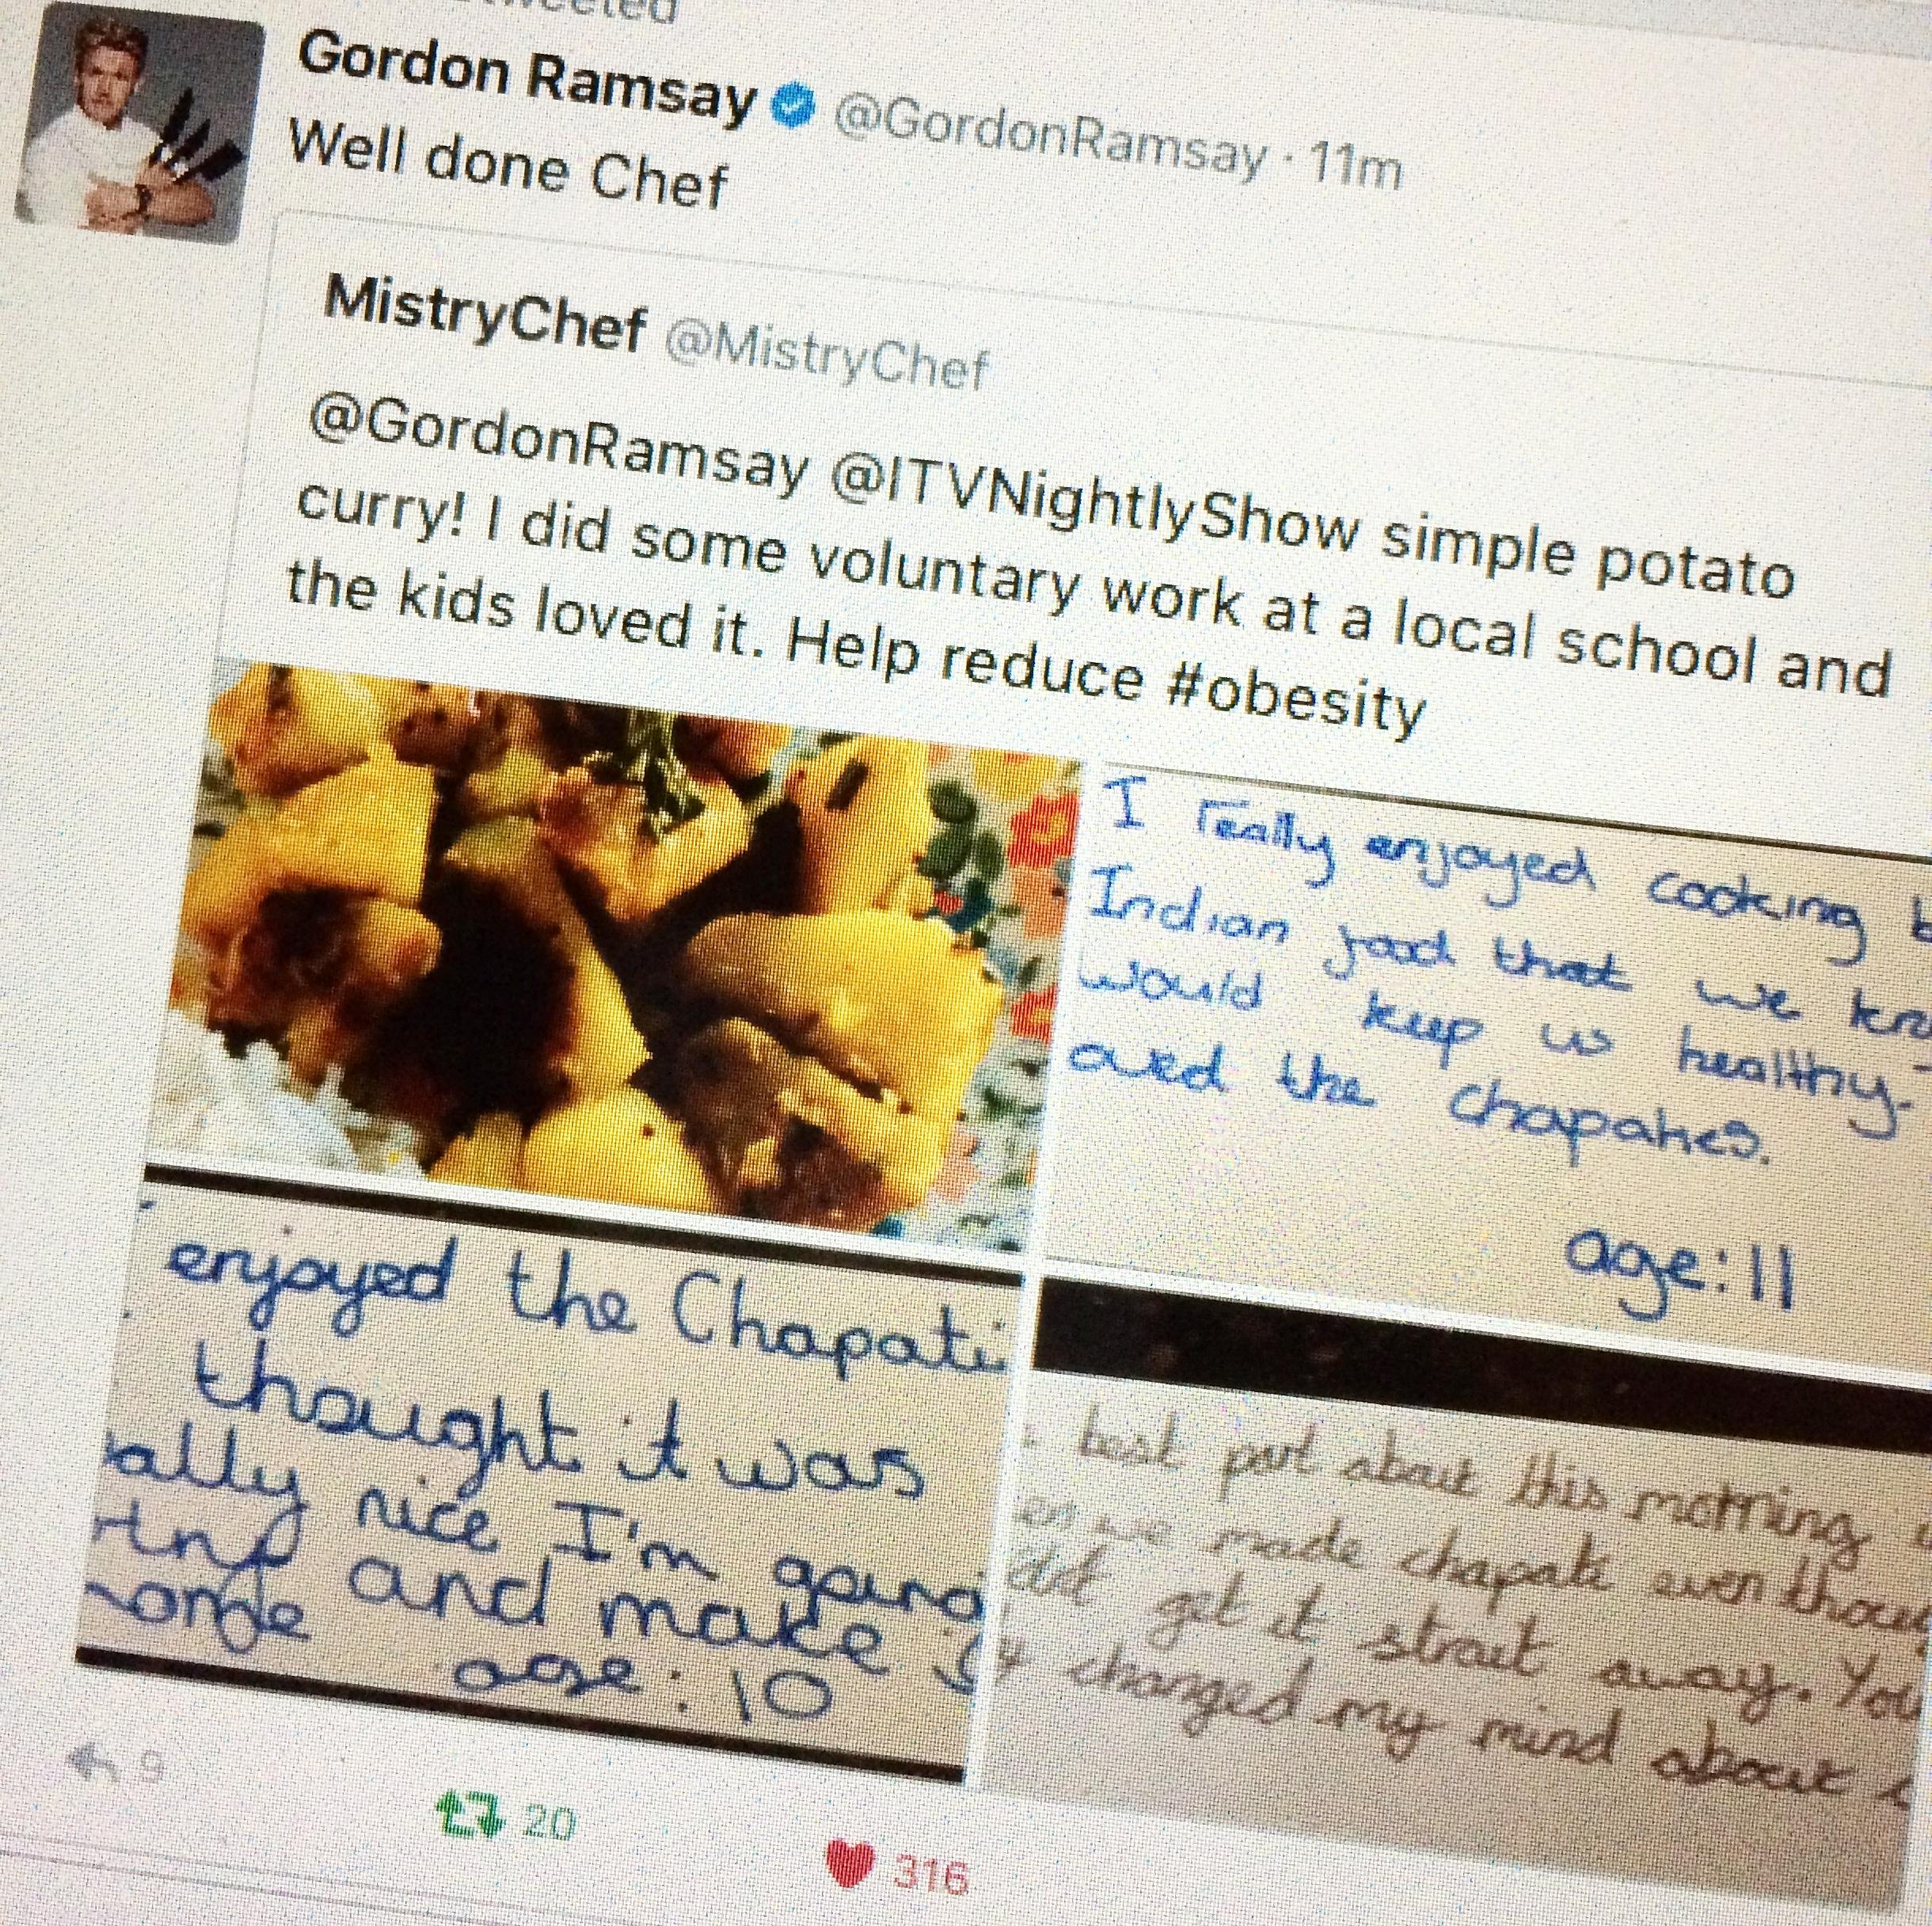 Gordon Ramsay - A 'profanity free' tweet!